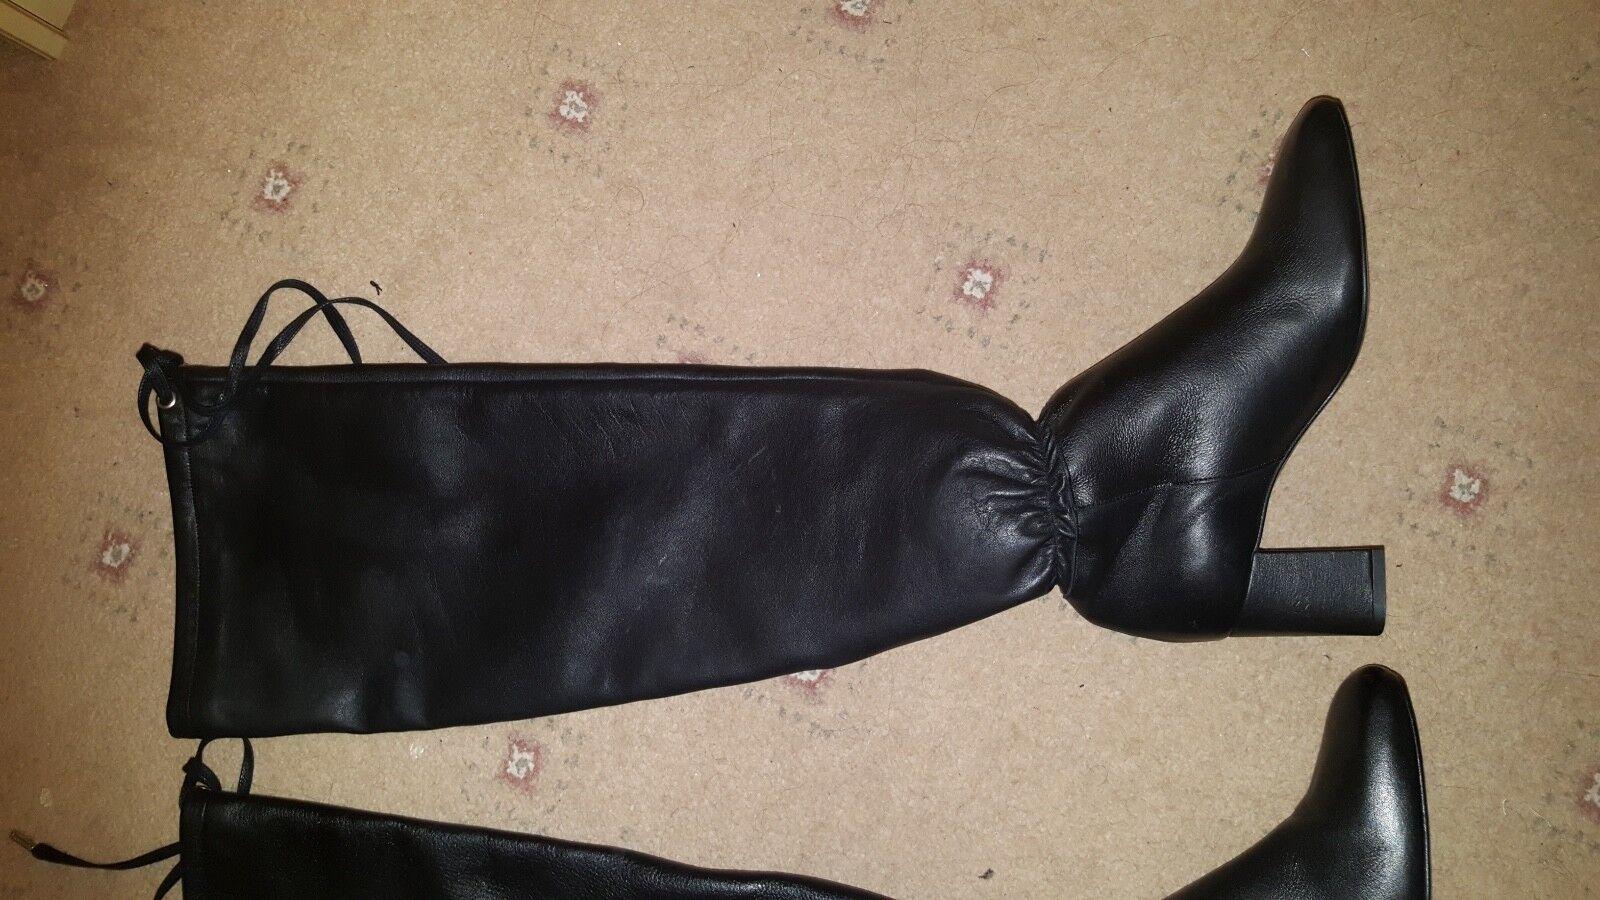 BNWT ZARA Negro Cuero Tacón Alto Zapatos botas de detalles reunidos Tacones